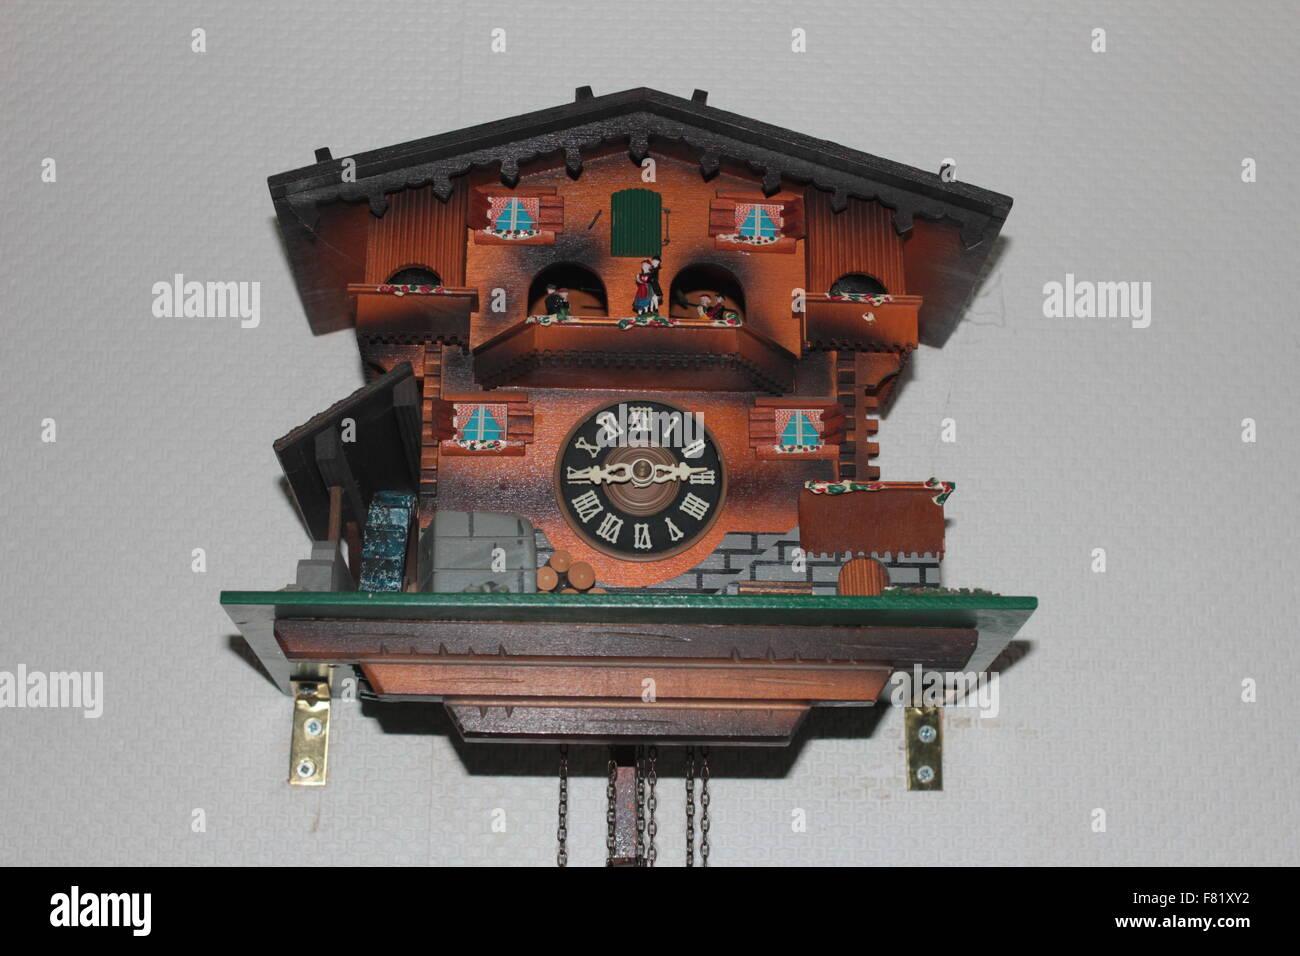 German Black Forest cuckoo clock - Stock Image